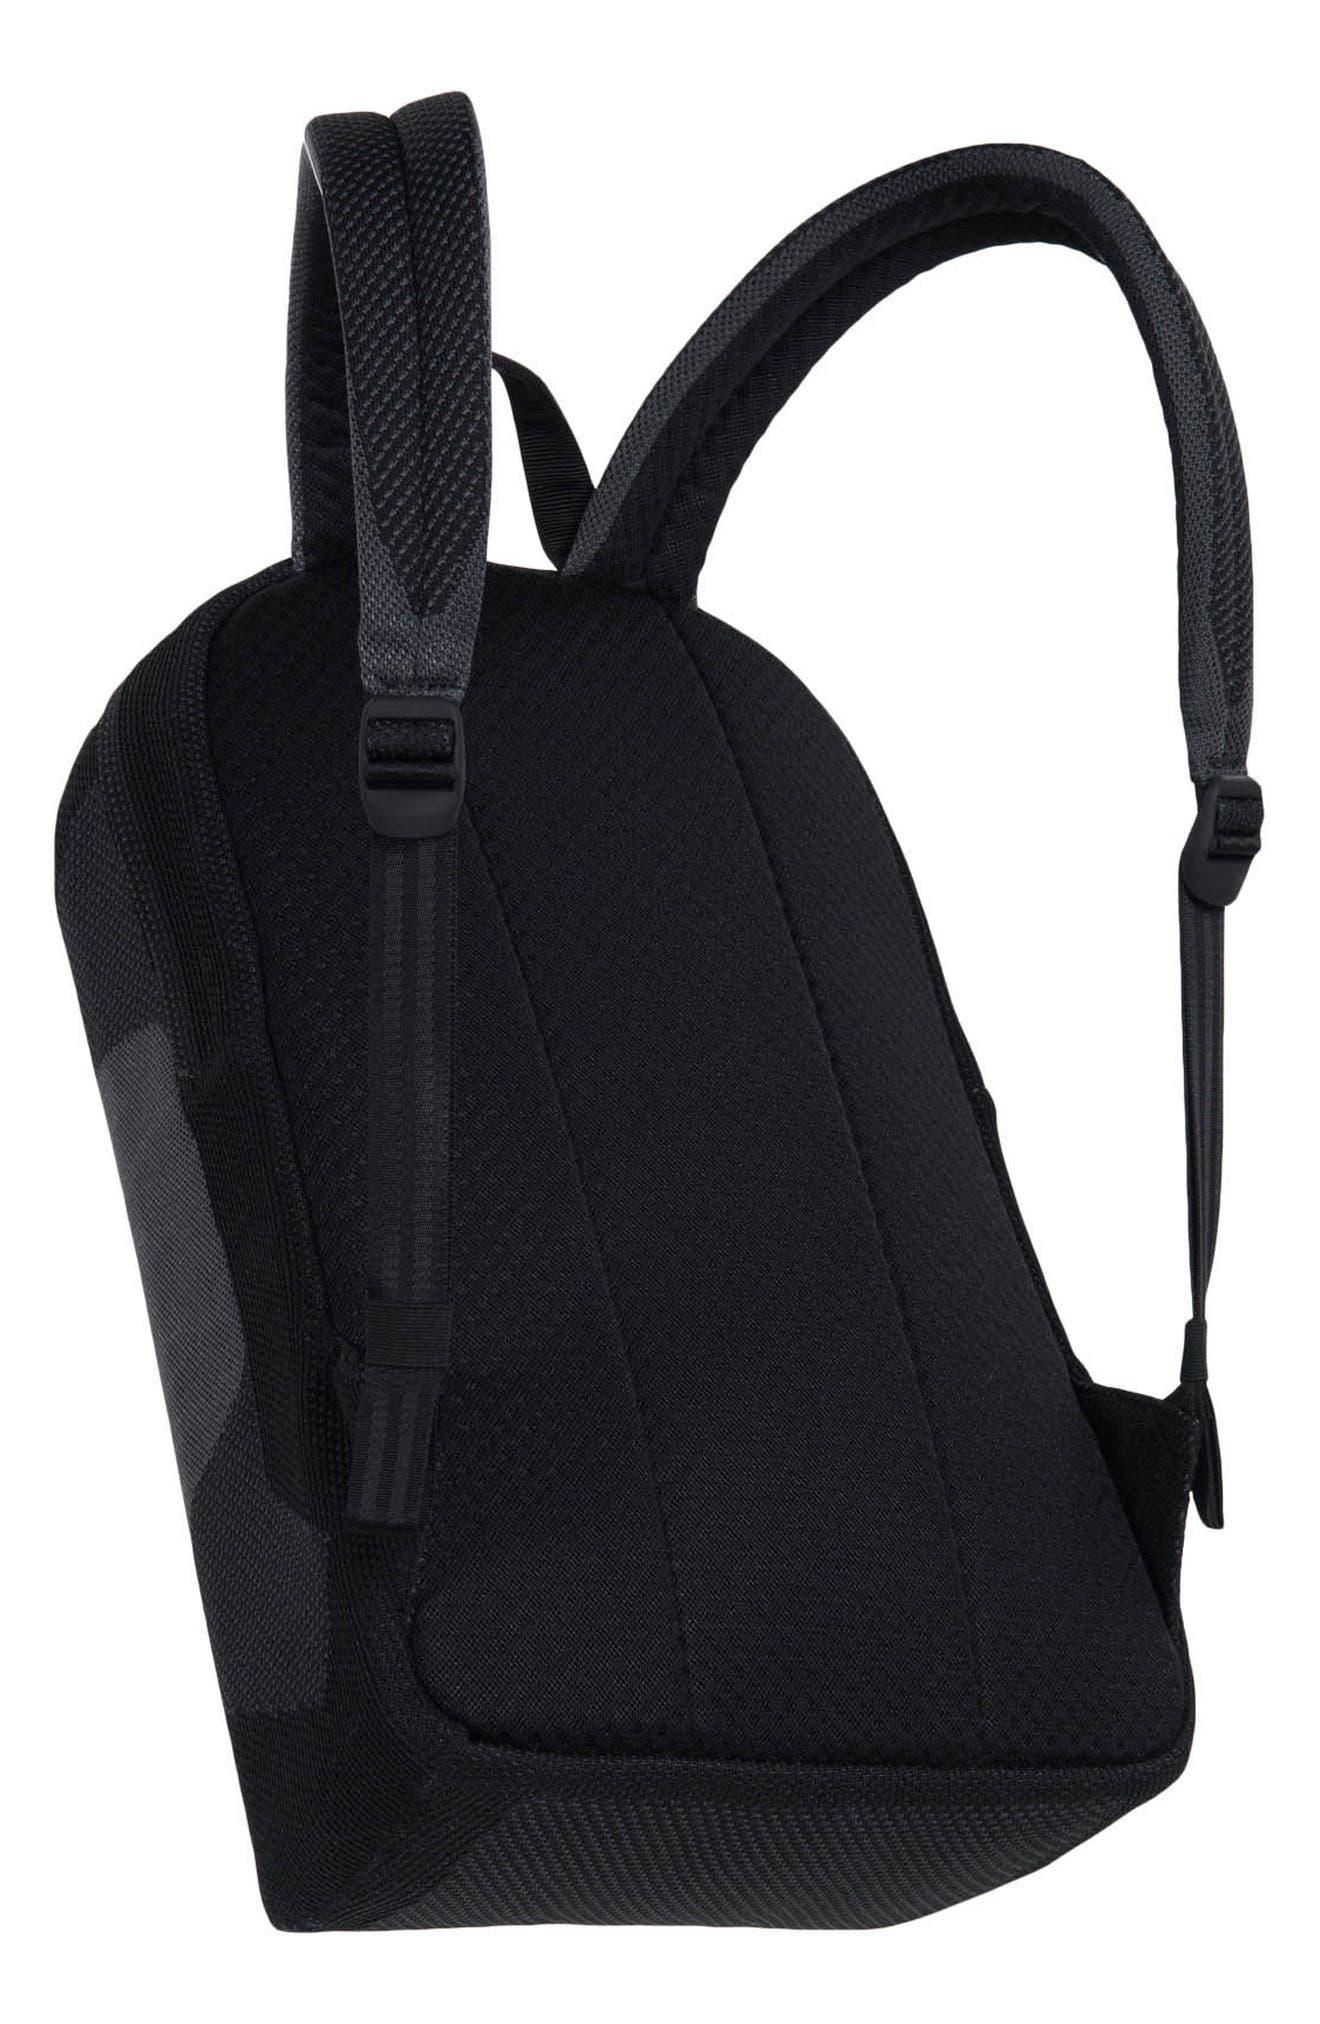 Apex Dayton Backpack,                             Alternate thumbnail 2, color,                             Black Beauty/ Dark Shadow